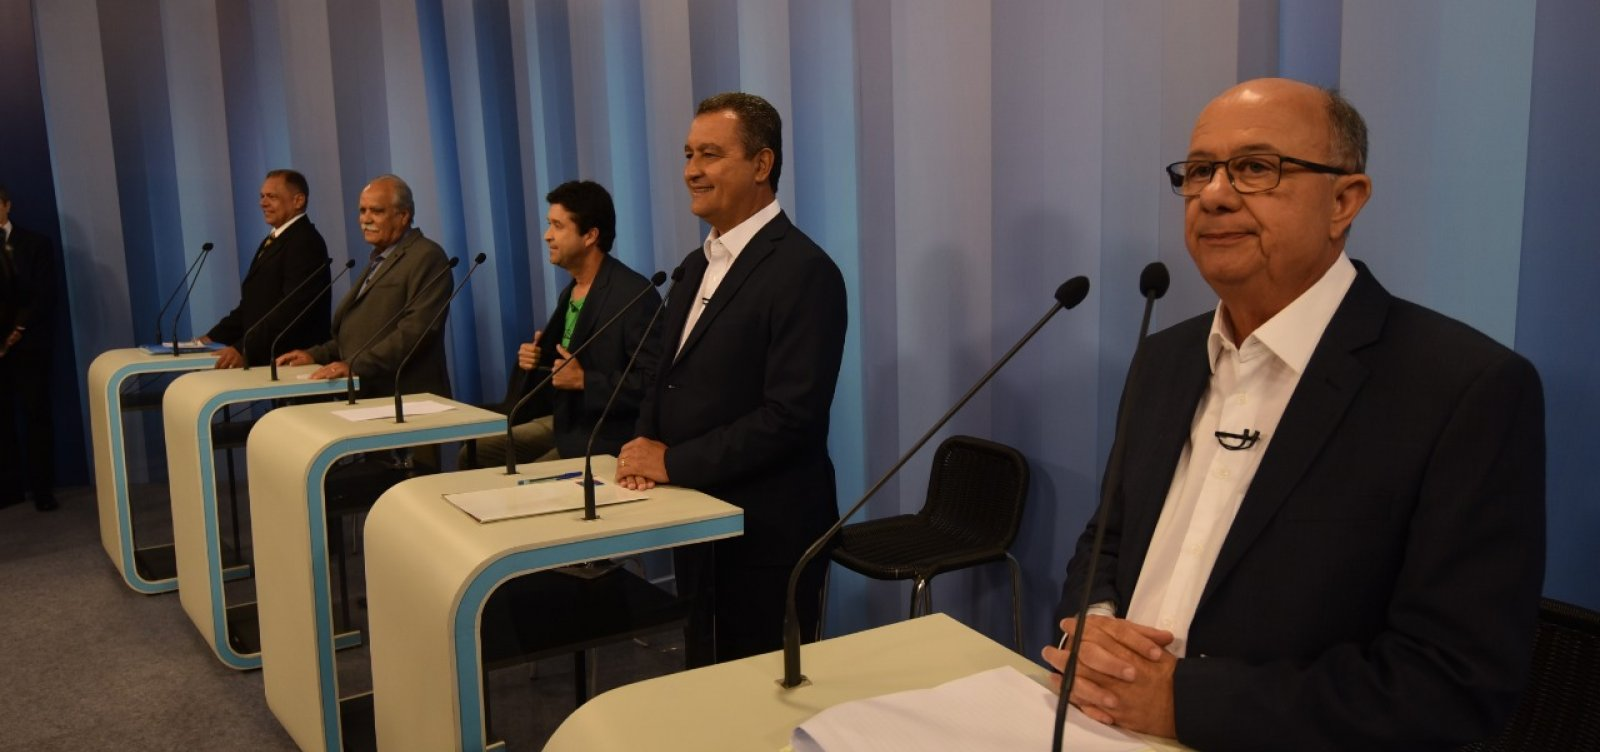 Debate na TV Bahia: 2° bloco tem defesa do Planserv e embate entre Rui x Ronaldo